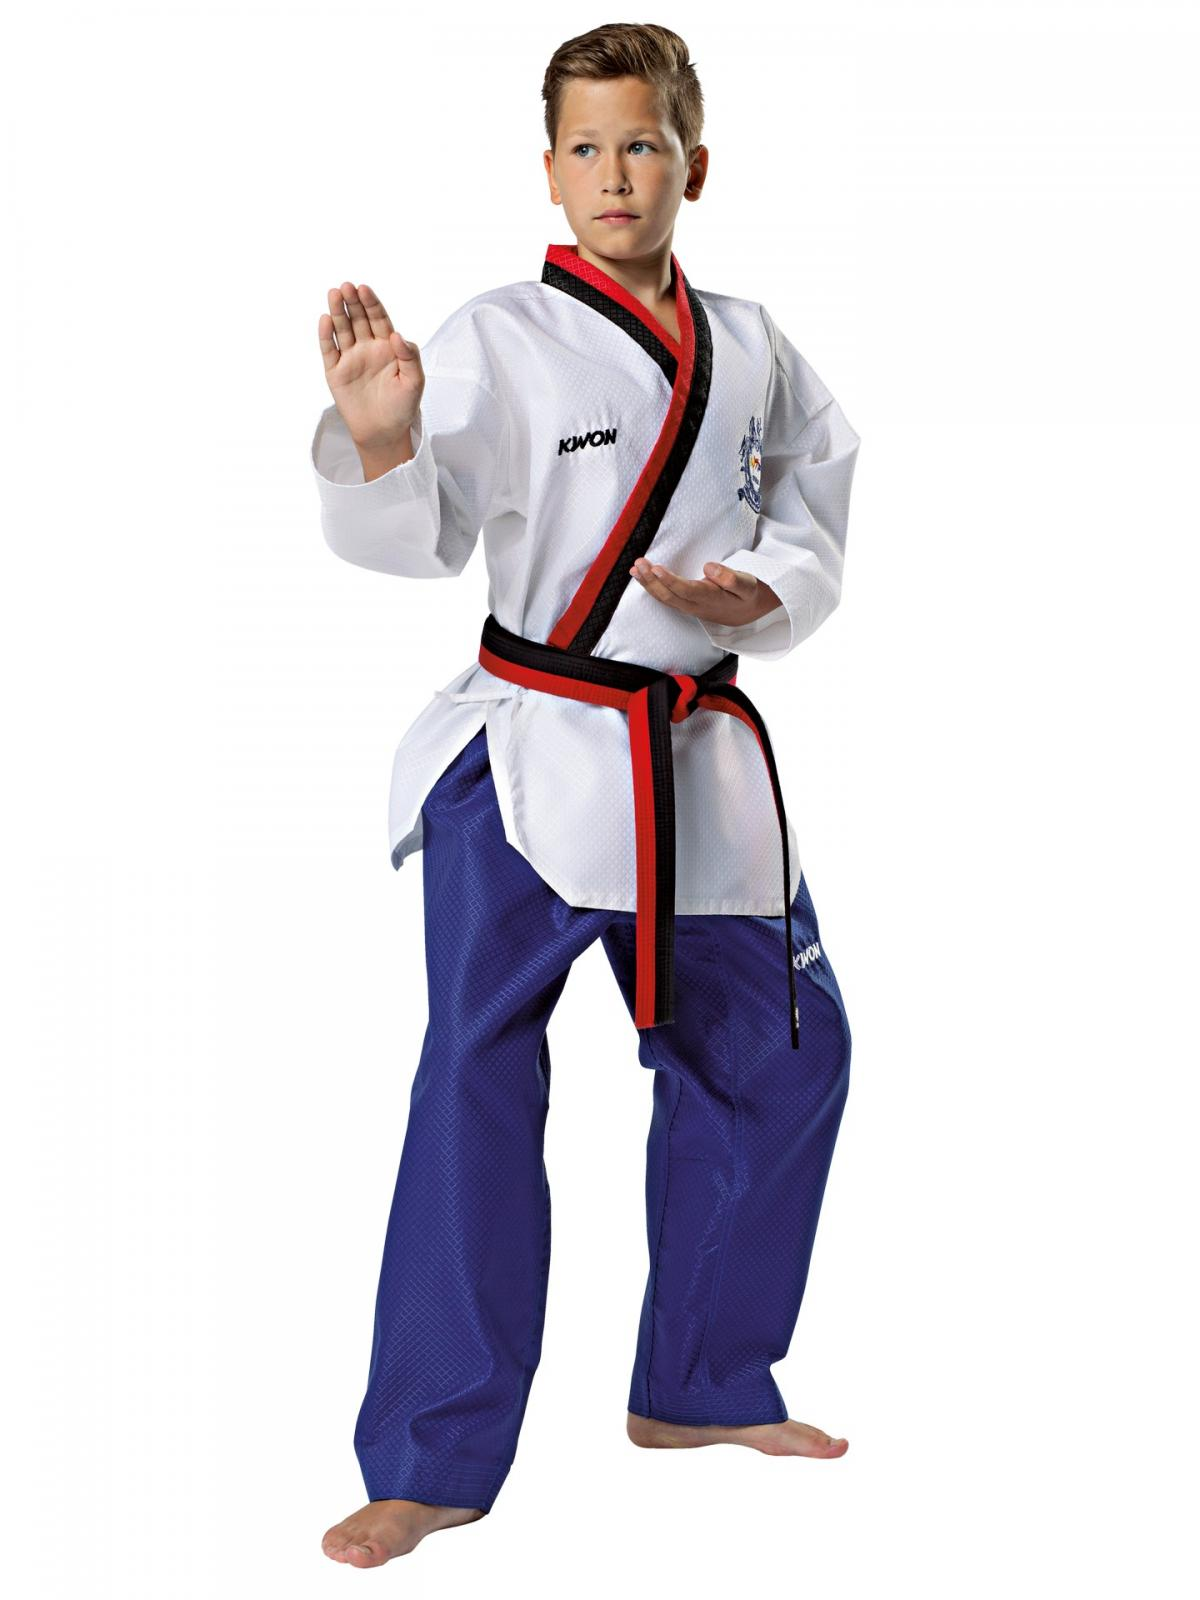 Kwon ® Starfighter Taekwondoanzug kleinem Schriftzug Dobok Taekwondo Anzug weiss